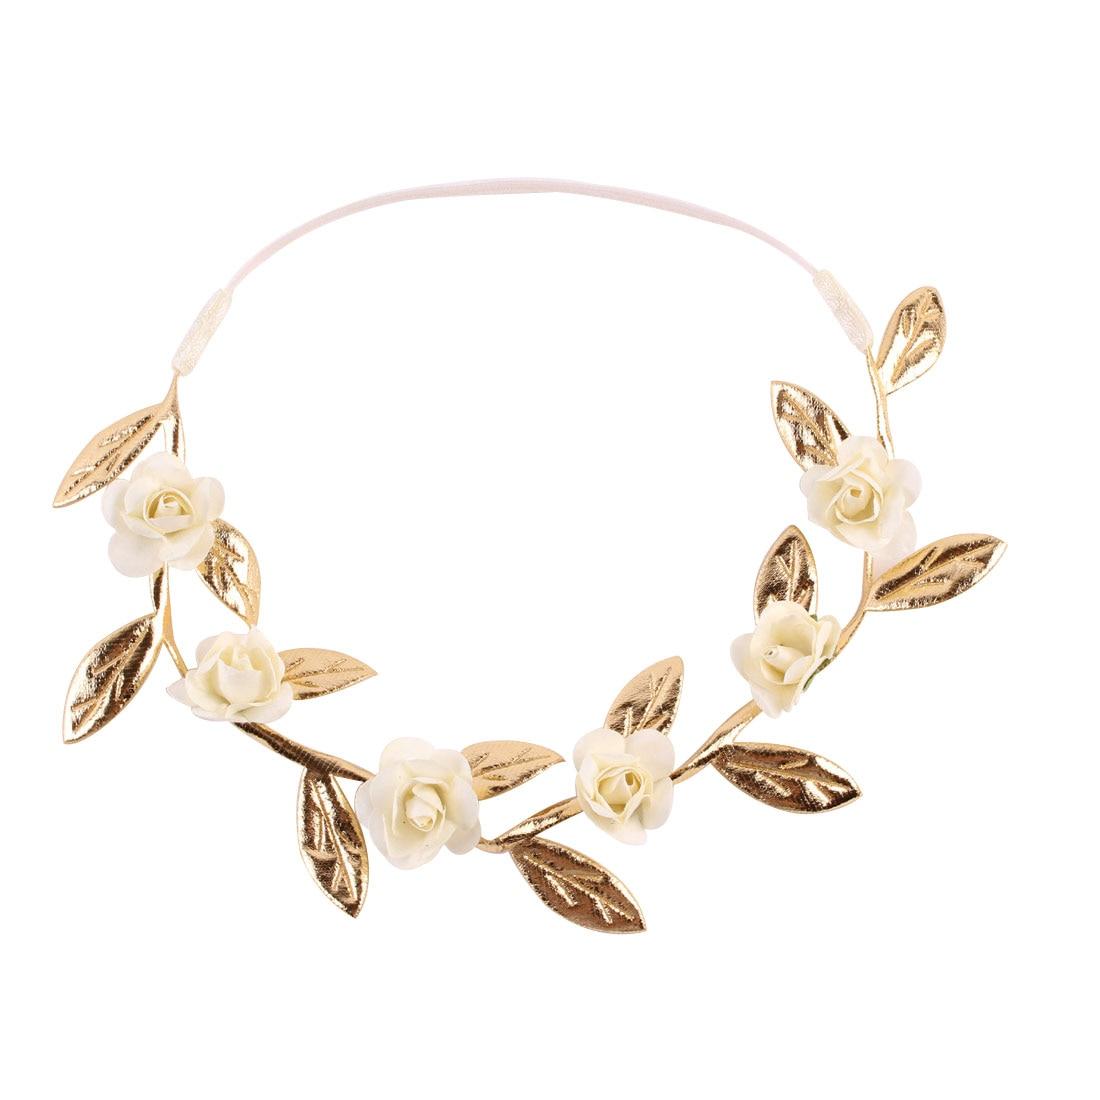 Baby Girl Kids Garlands Crown Headband  Gold Leaves Hair Band Rose Flower Wreath